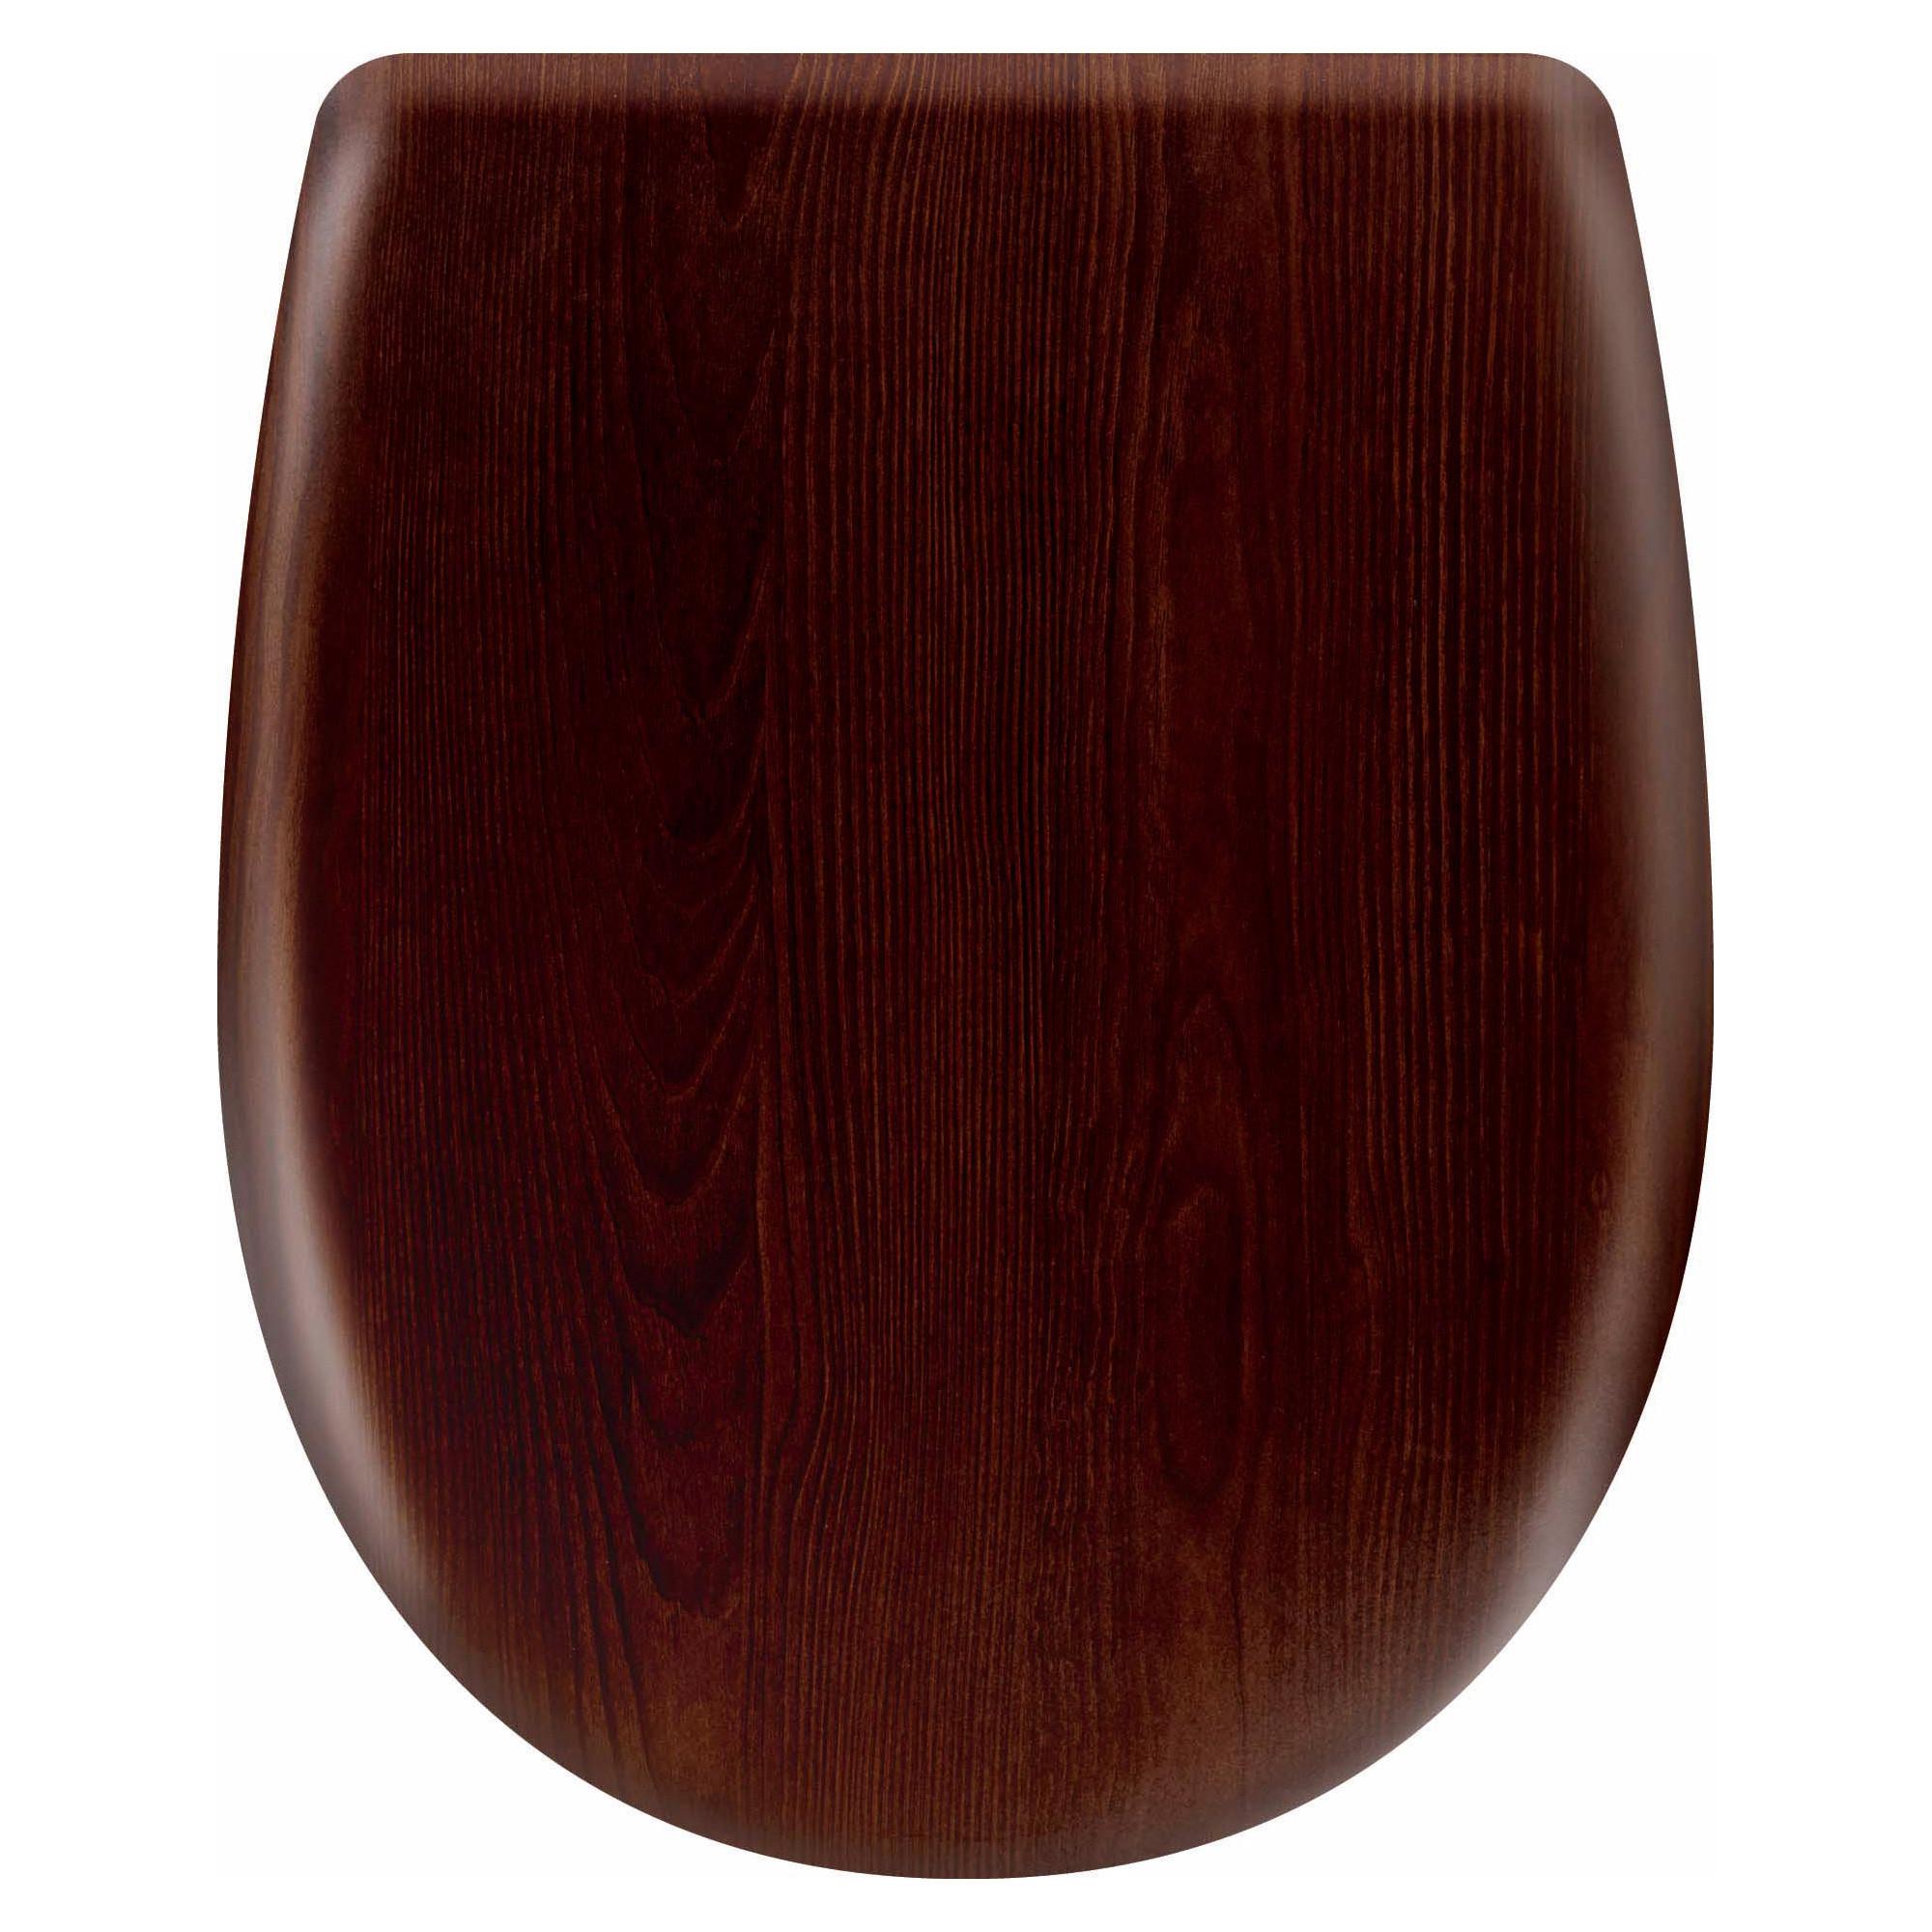 abattant wc bois olfa weng mat anjou connectique. Black Bedroom Furniture Sets. Home Design Ideas